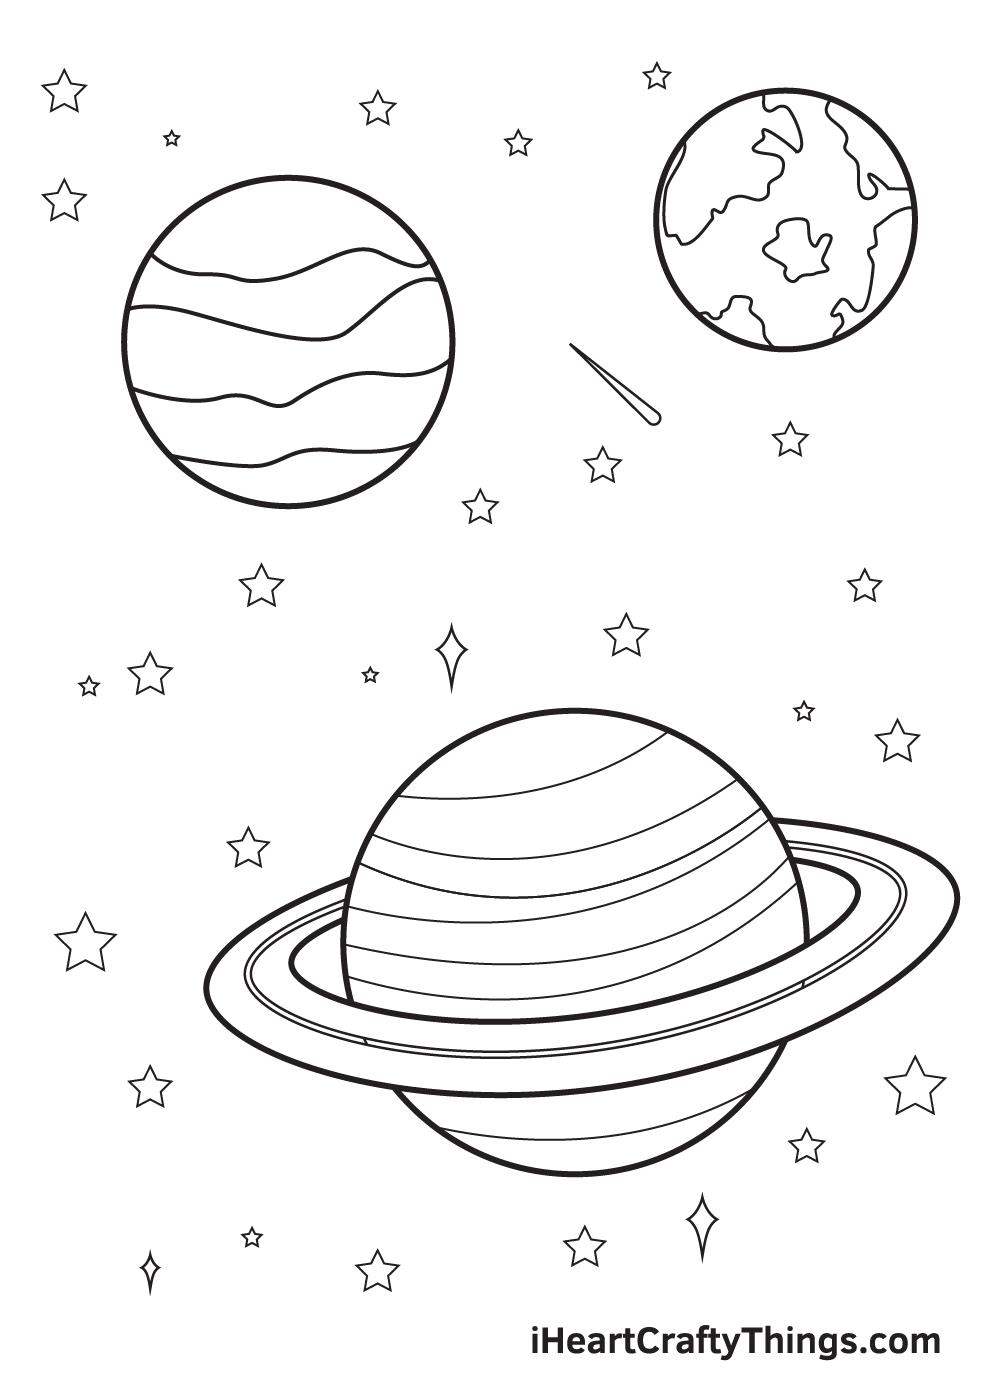 galaxy drawing - step 9